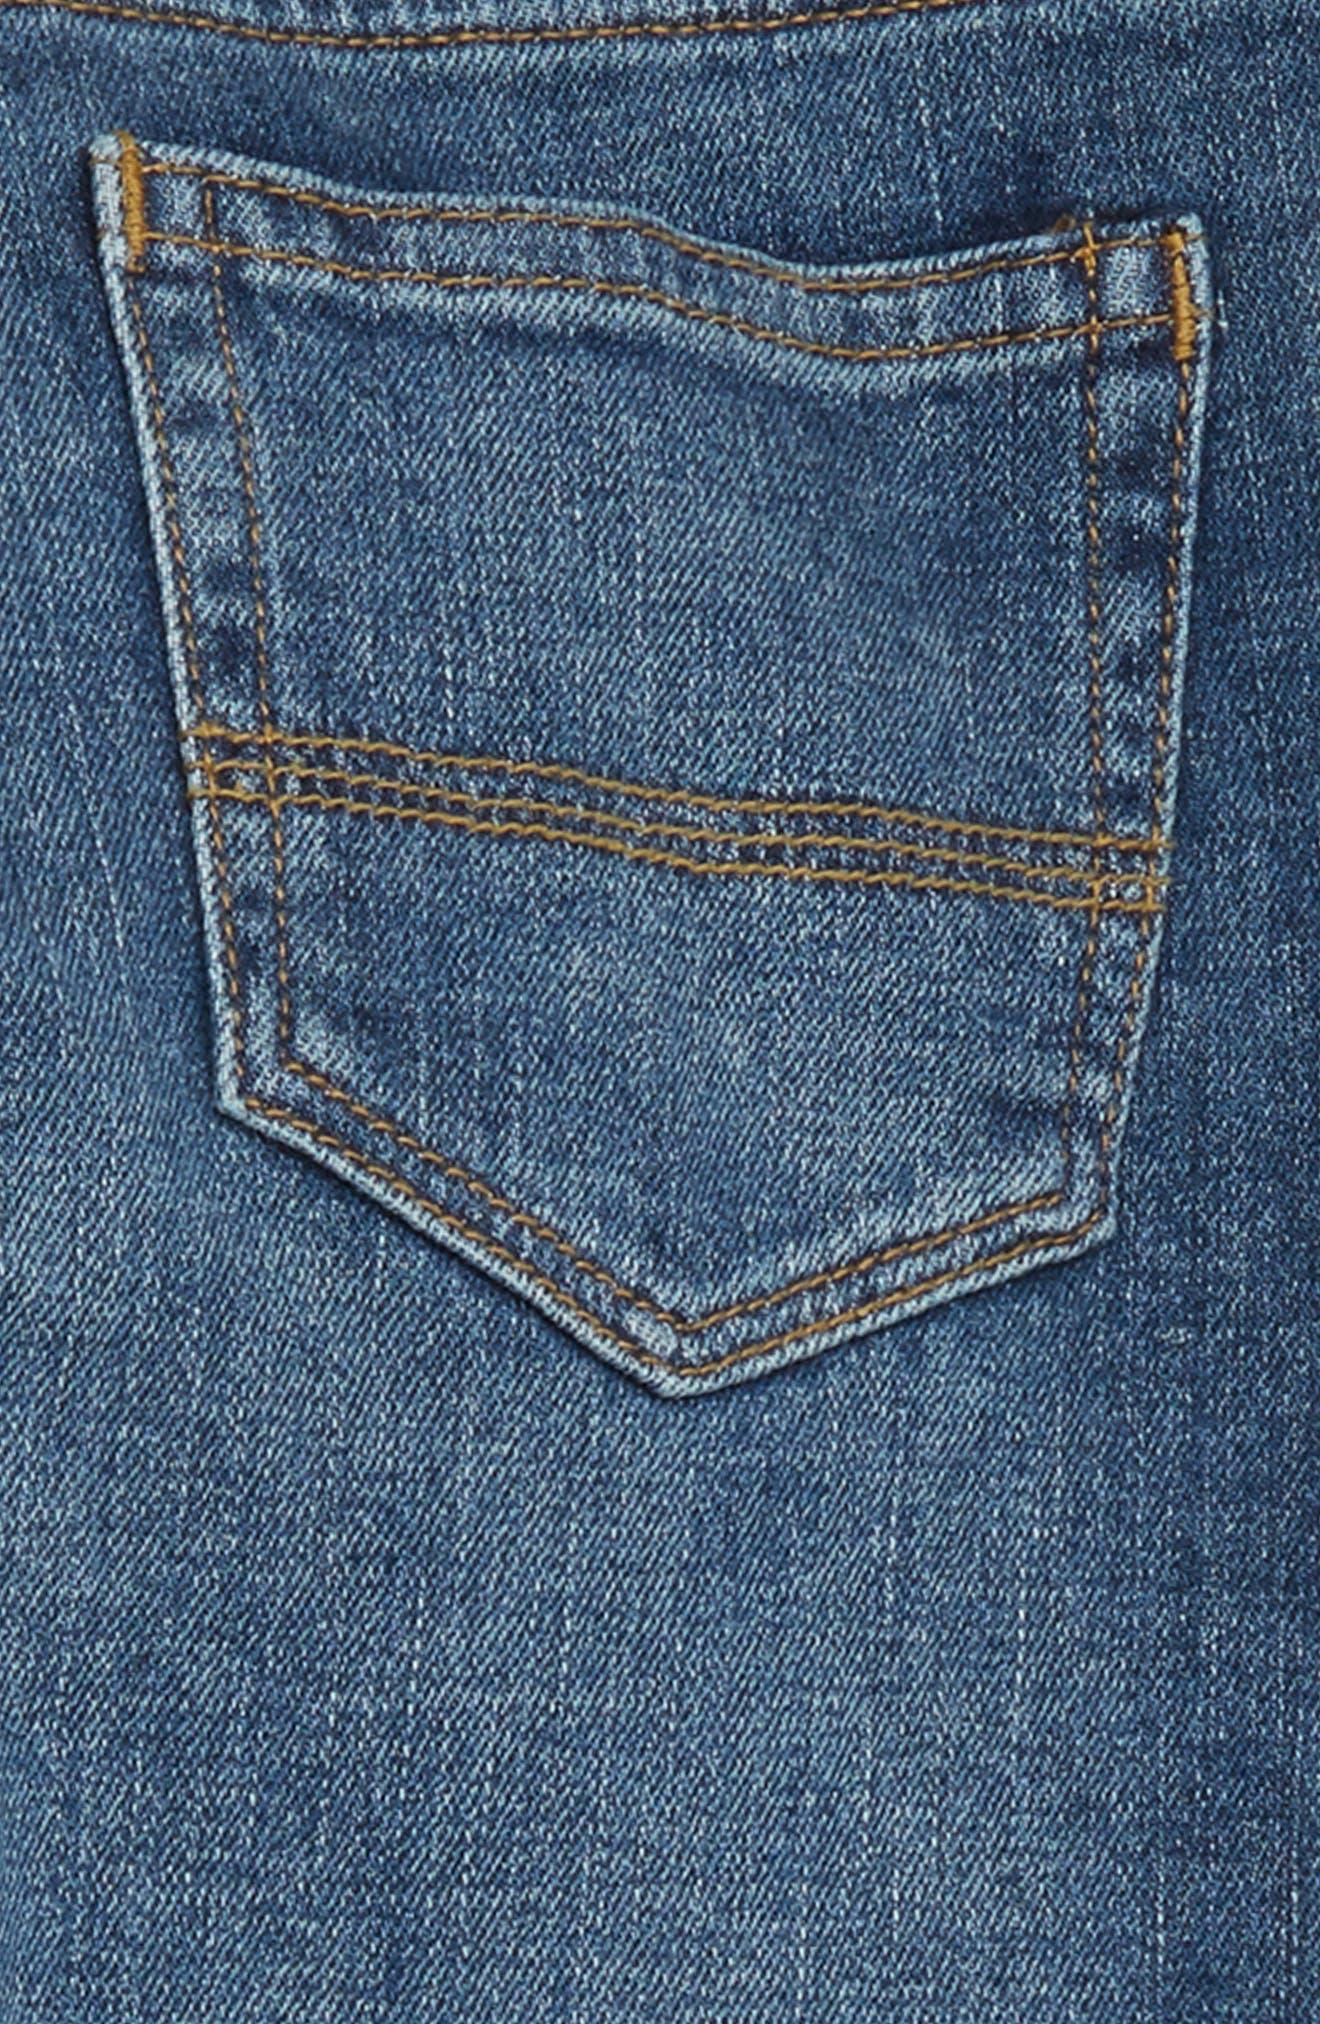 Slouch Jeans,                             Alternate thumbnail 3, color,                             400